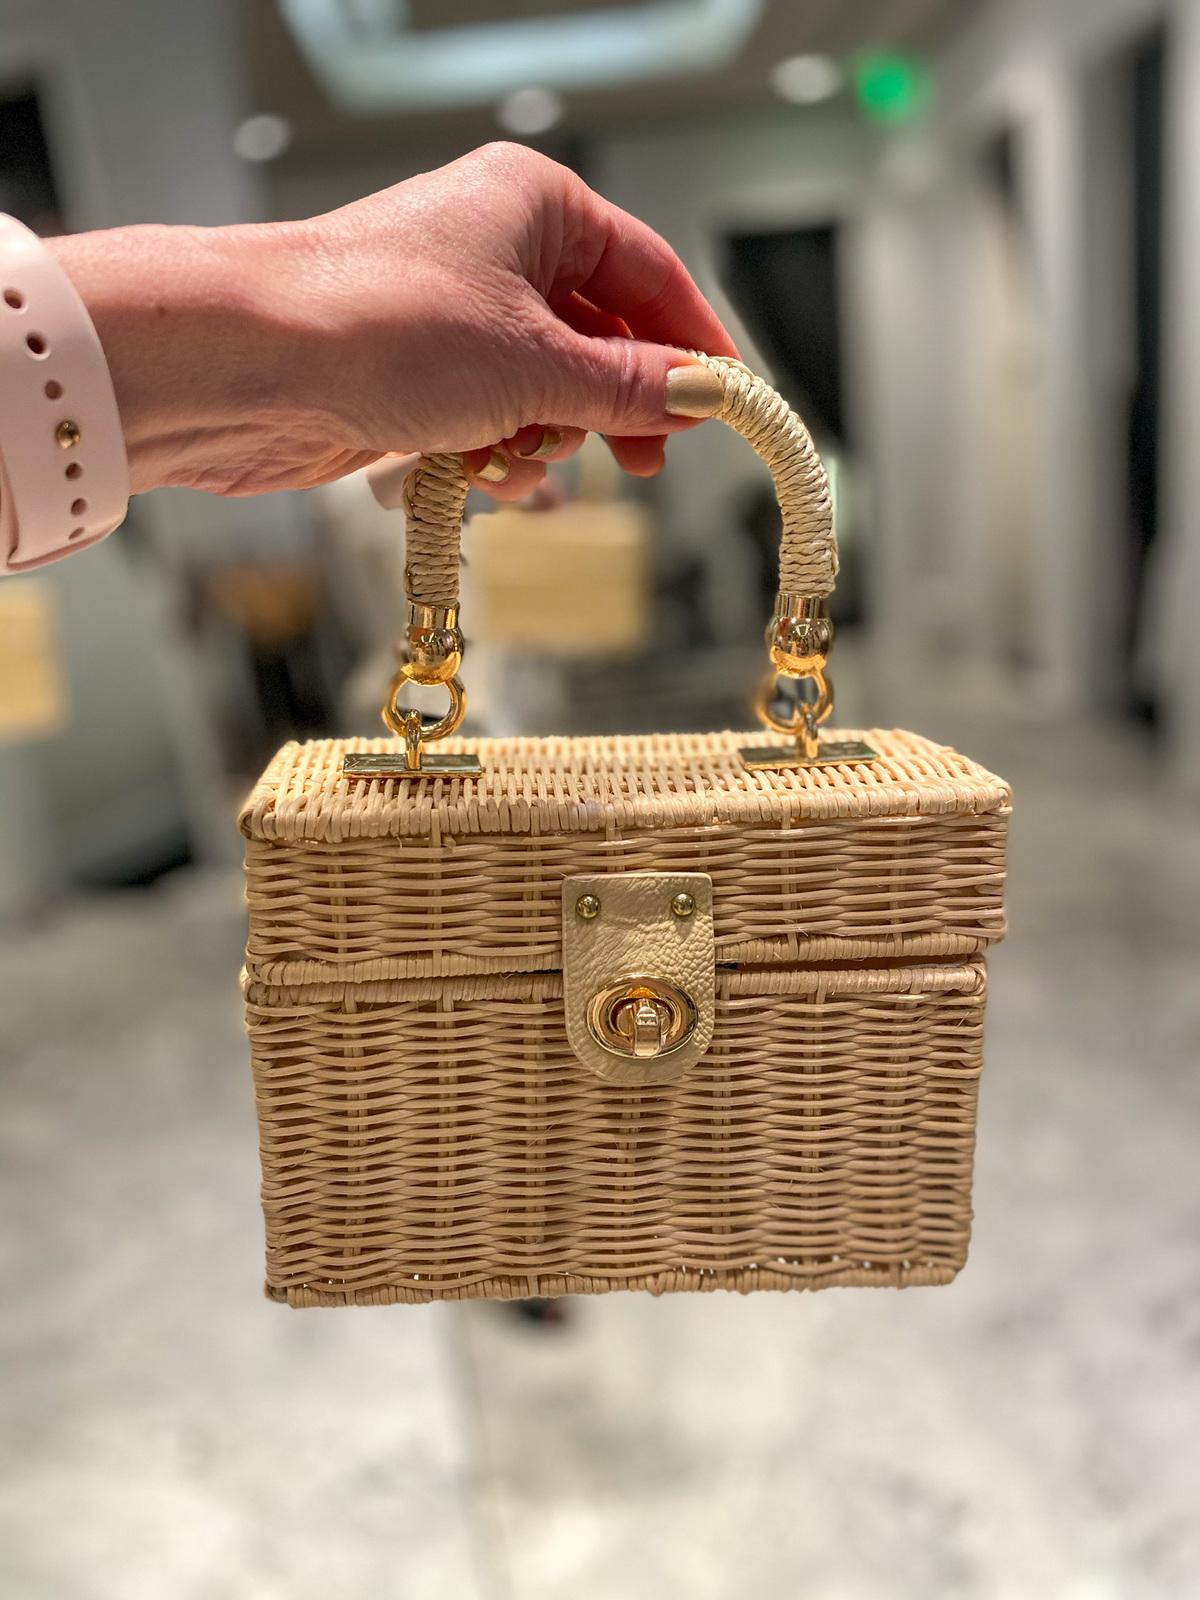 womans hand holding wicker box handbag